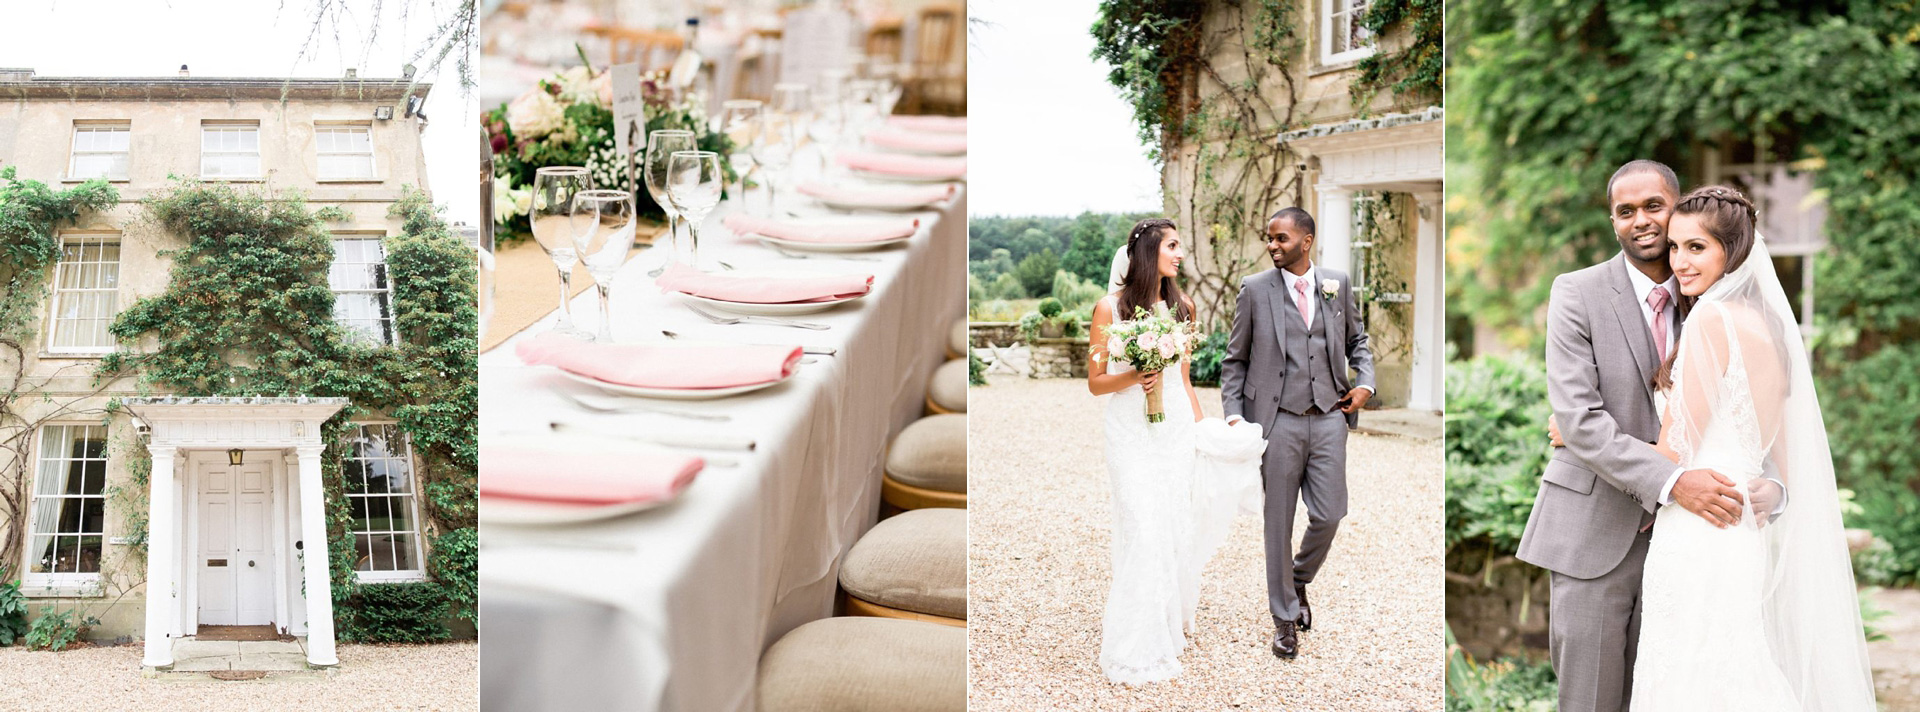 Luxury-Wedding-Photography-by-Fine-Art-Wedding-Photography-Lilybean-Photography-03